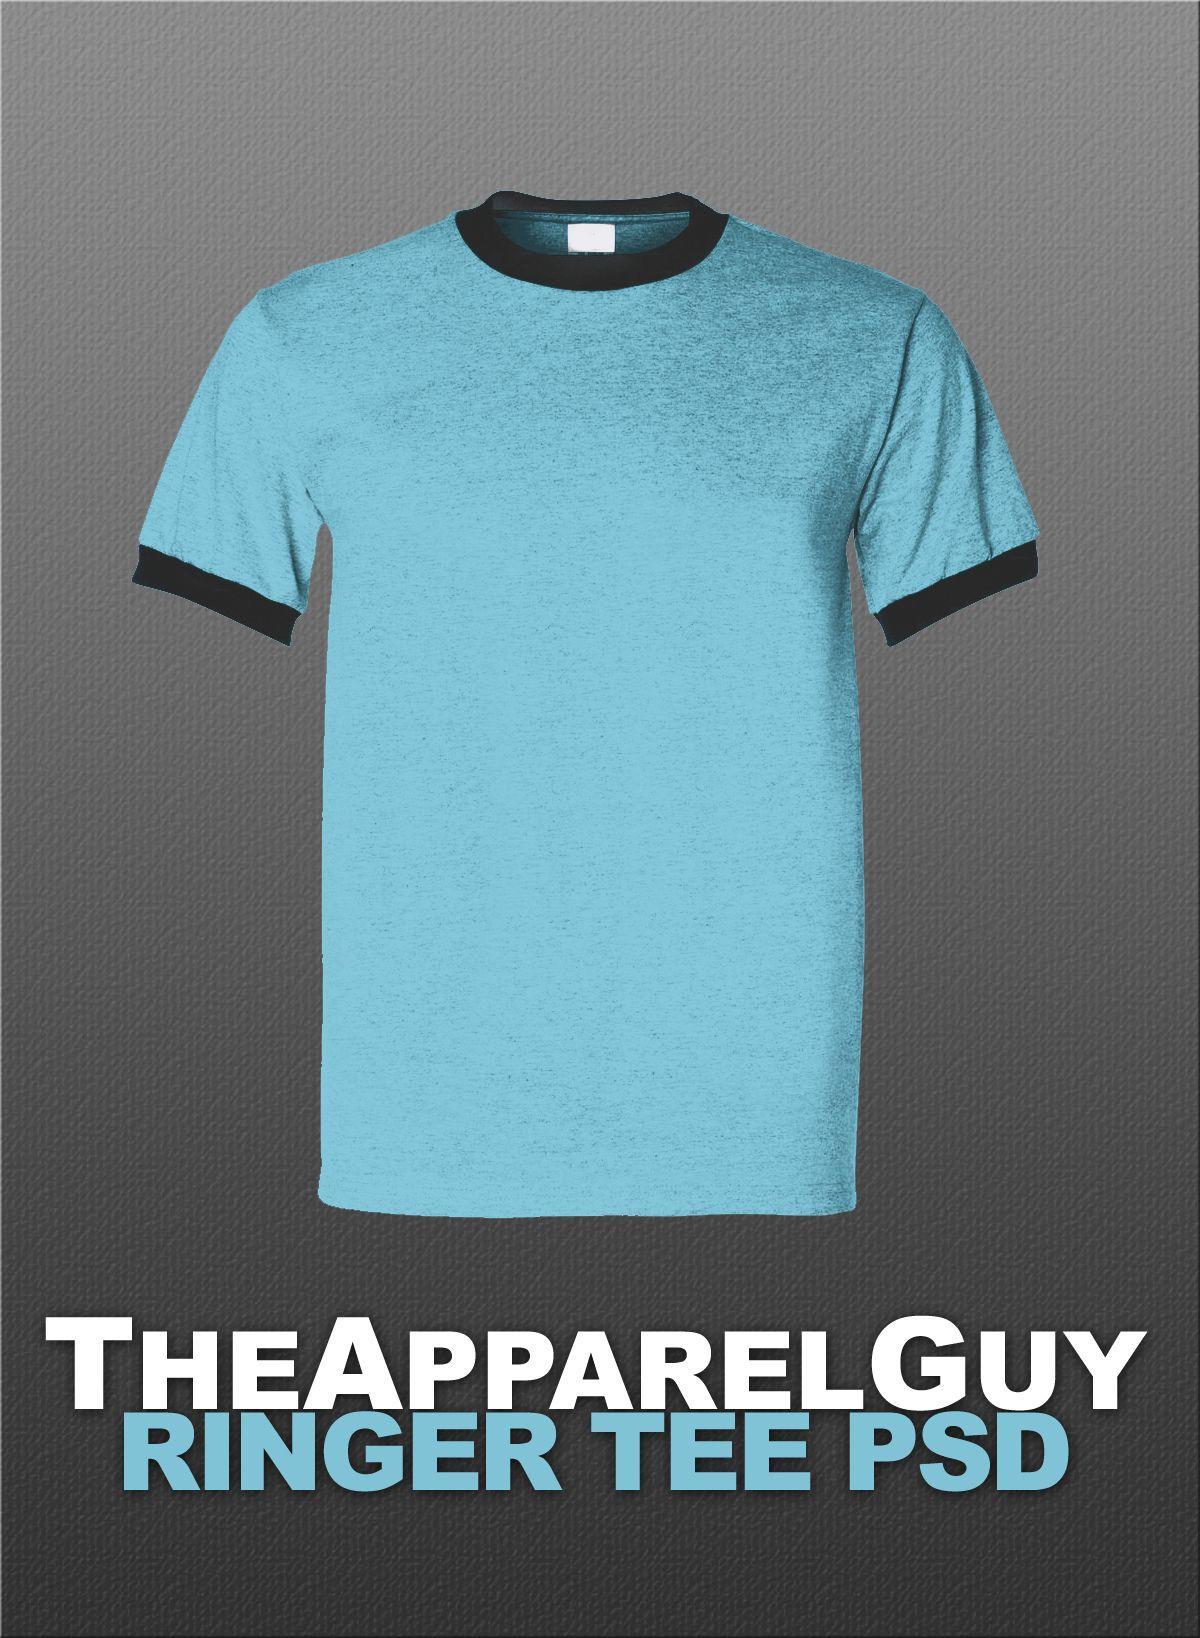 Ringer Tee Psd By Theapparelguy Deviantart Com On Deviantart Shirt Template Ringer Tee Custom Tshirt Design T shirt template for photoshop